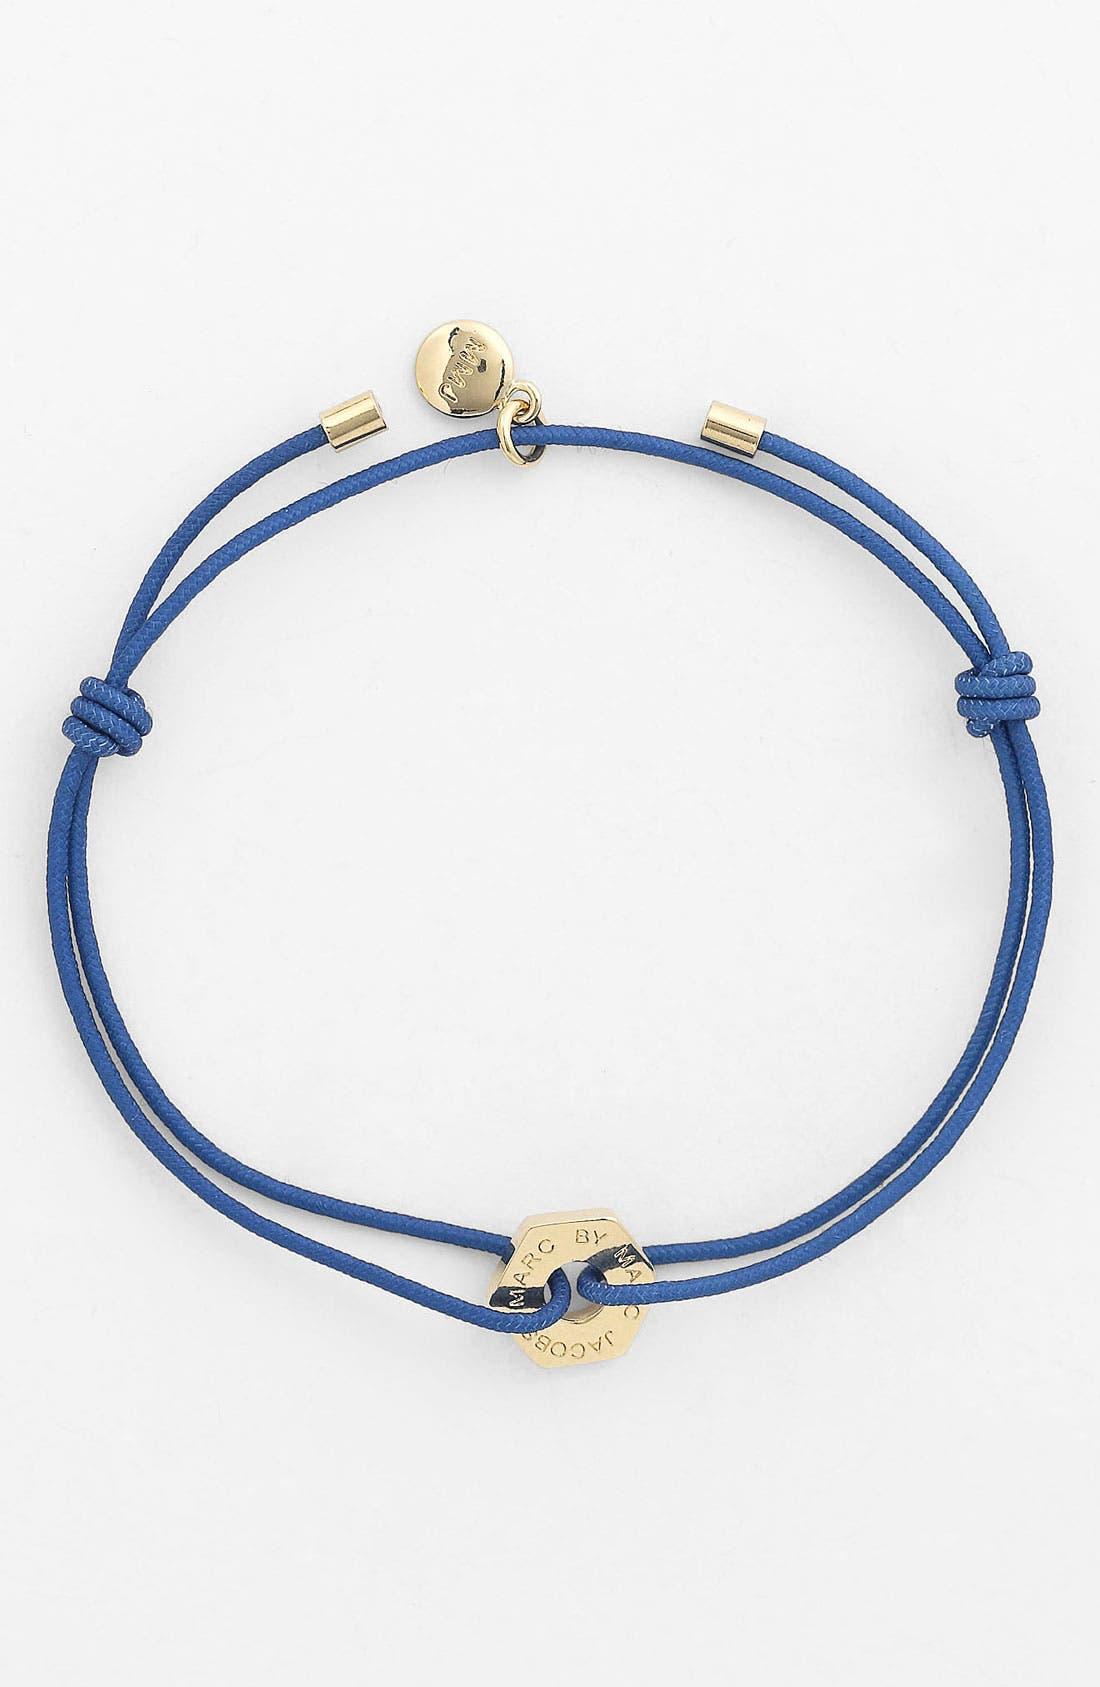 Main Image - MARC BY MARC JACOBS 'Bolts' Friendship Bracelet